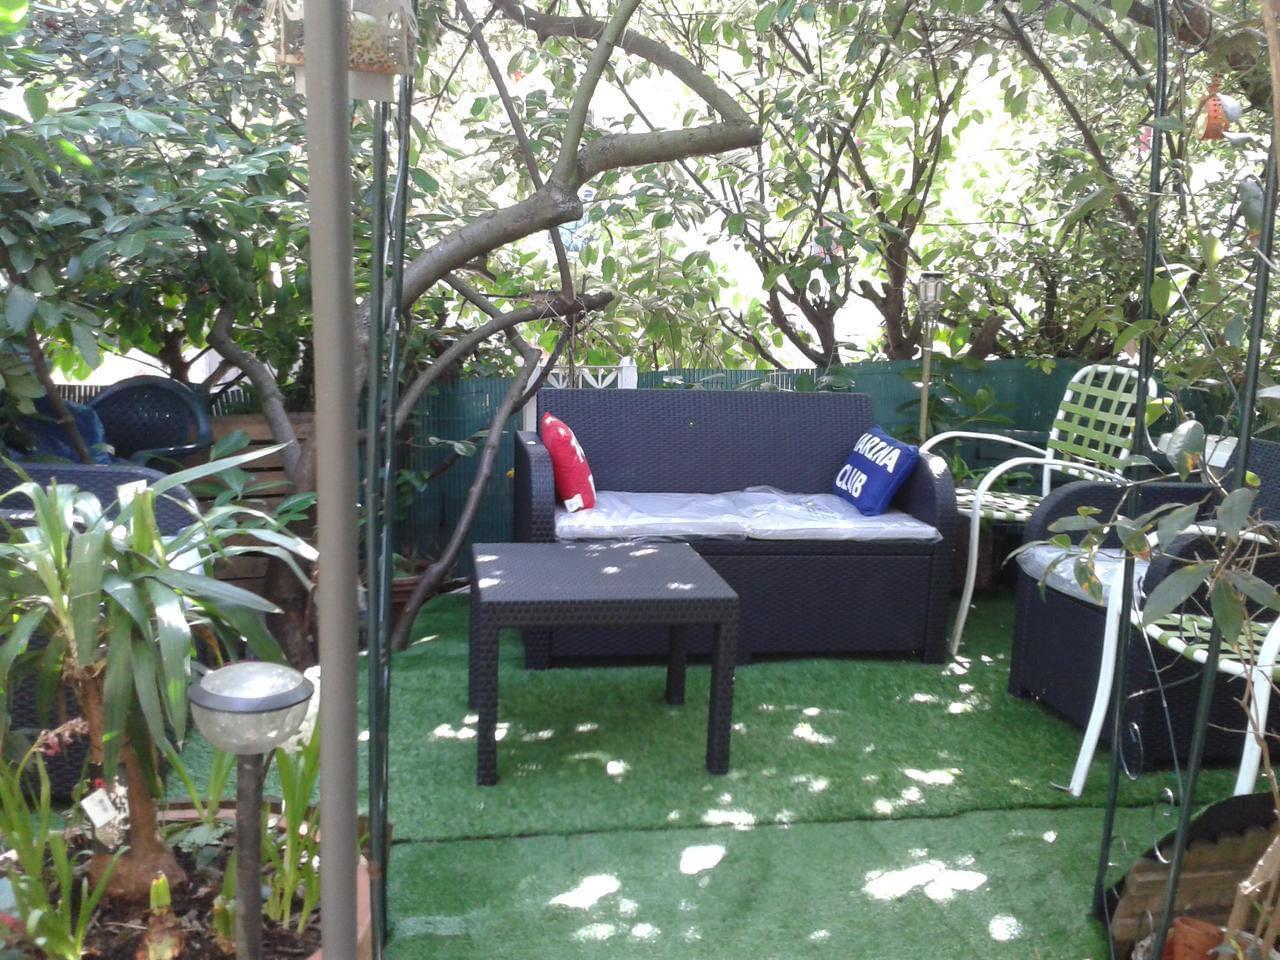 stade roazhon park spot de football rennes bretagne. Black Bedroom Furniture Sets. Home Design Ideas